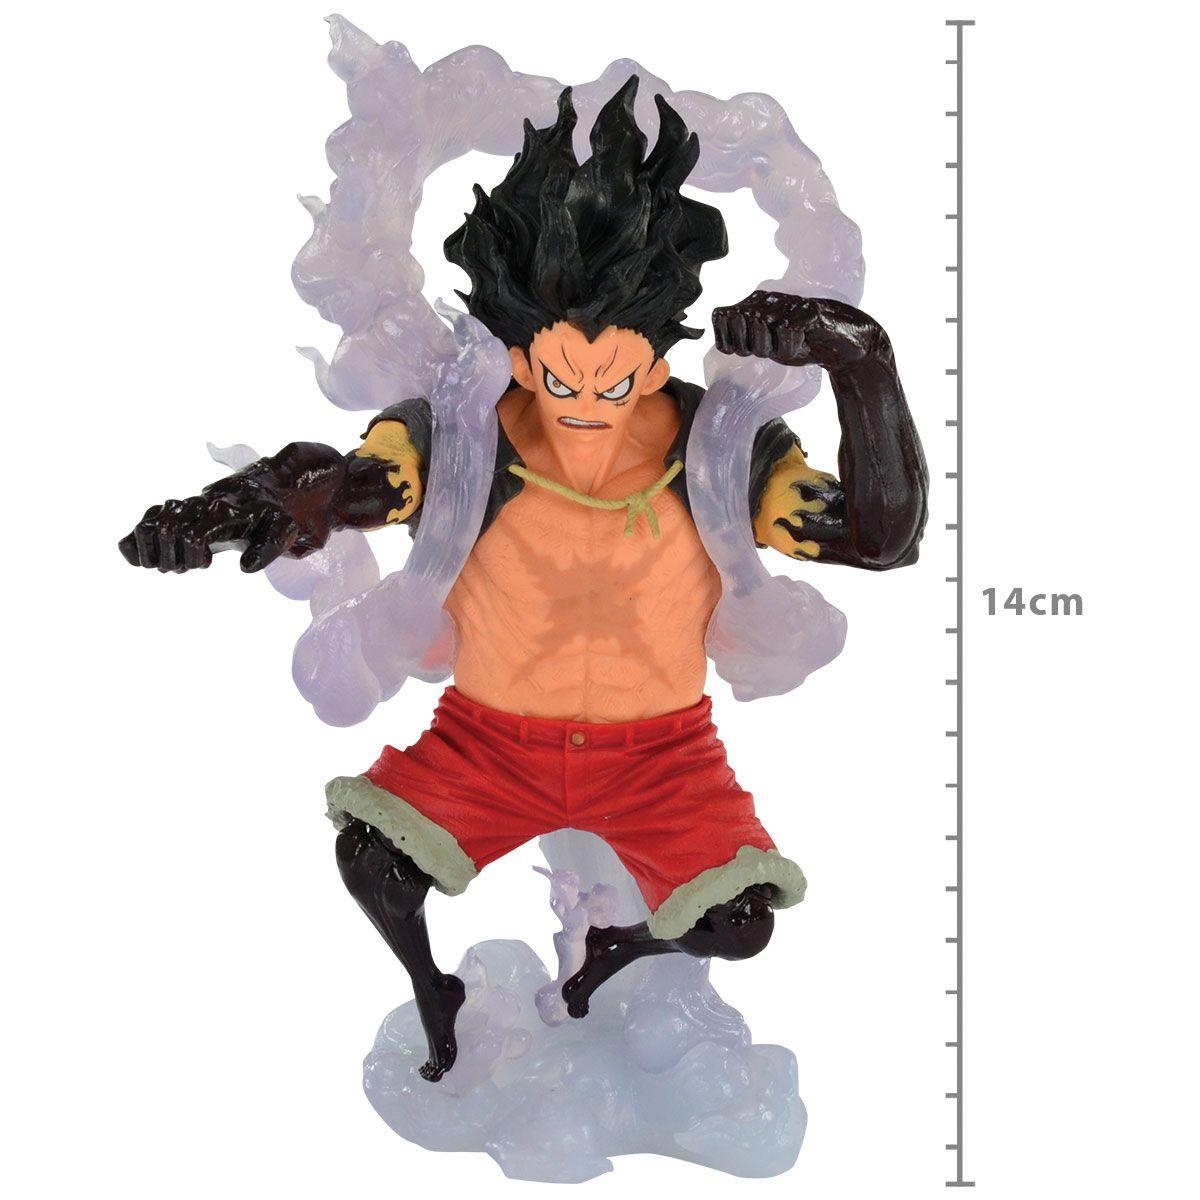 One Piece - Monkey D. Luffy - The Snakeman - King of Artist - Bandai Banpresto